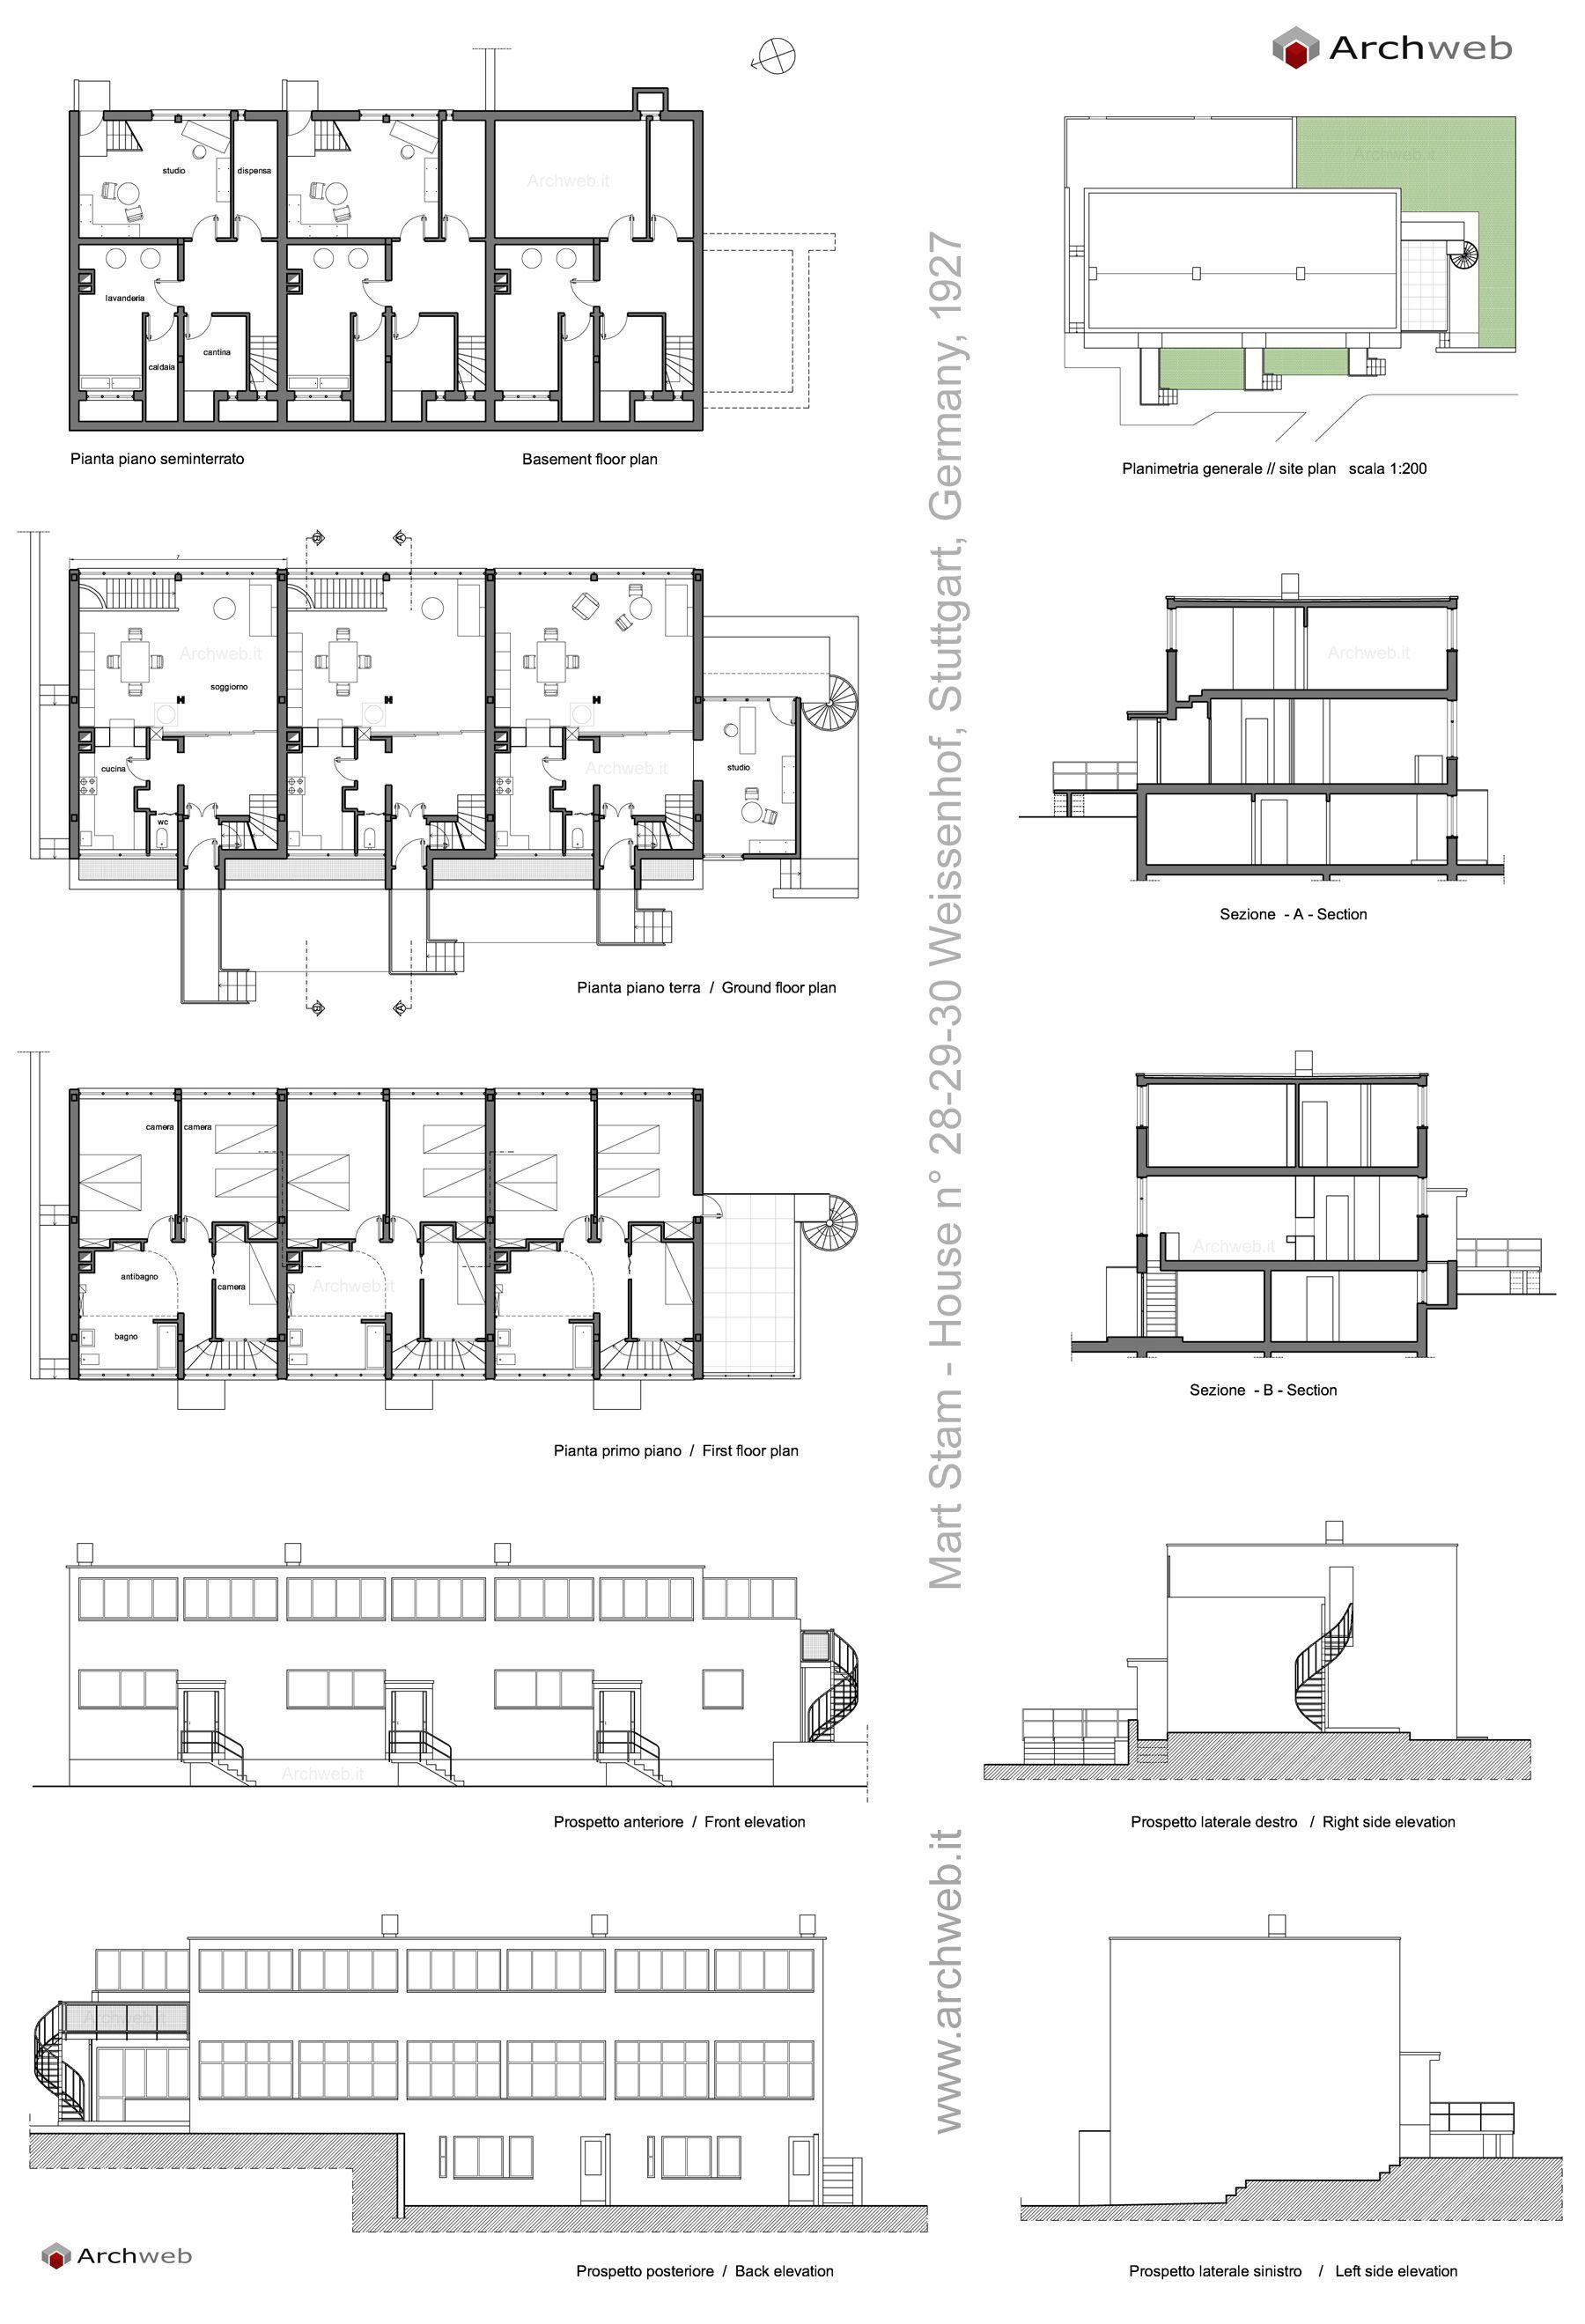 Mart Stam Buildings In Weissenhof 28 29 30